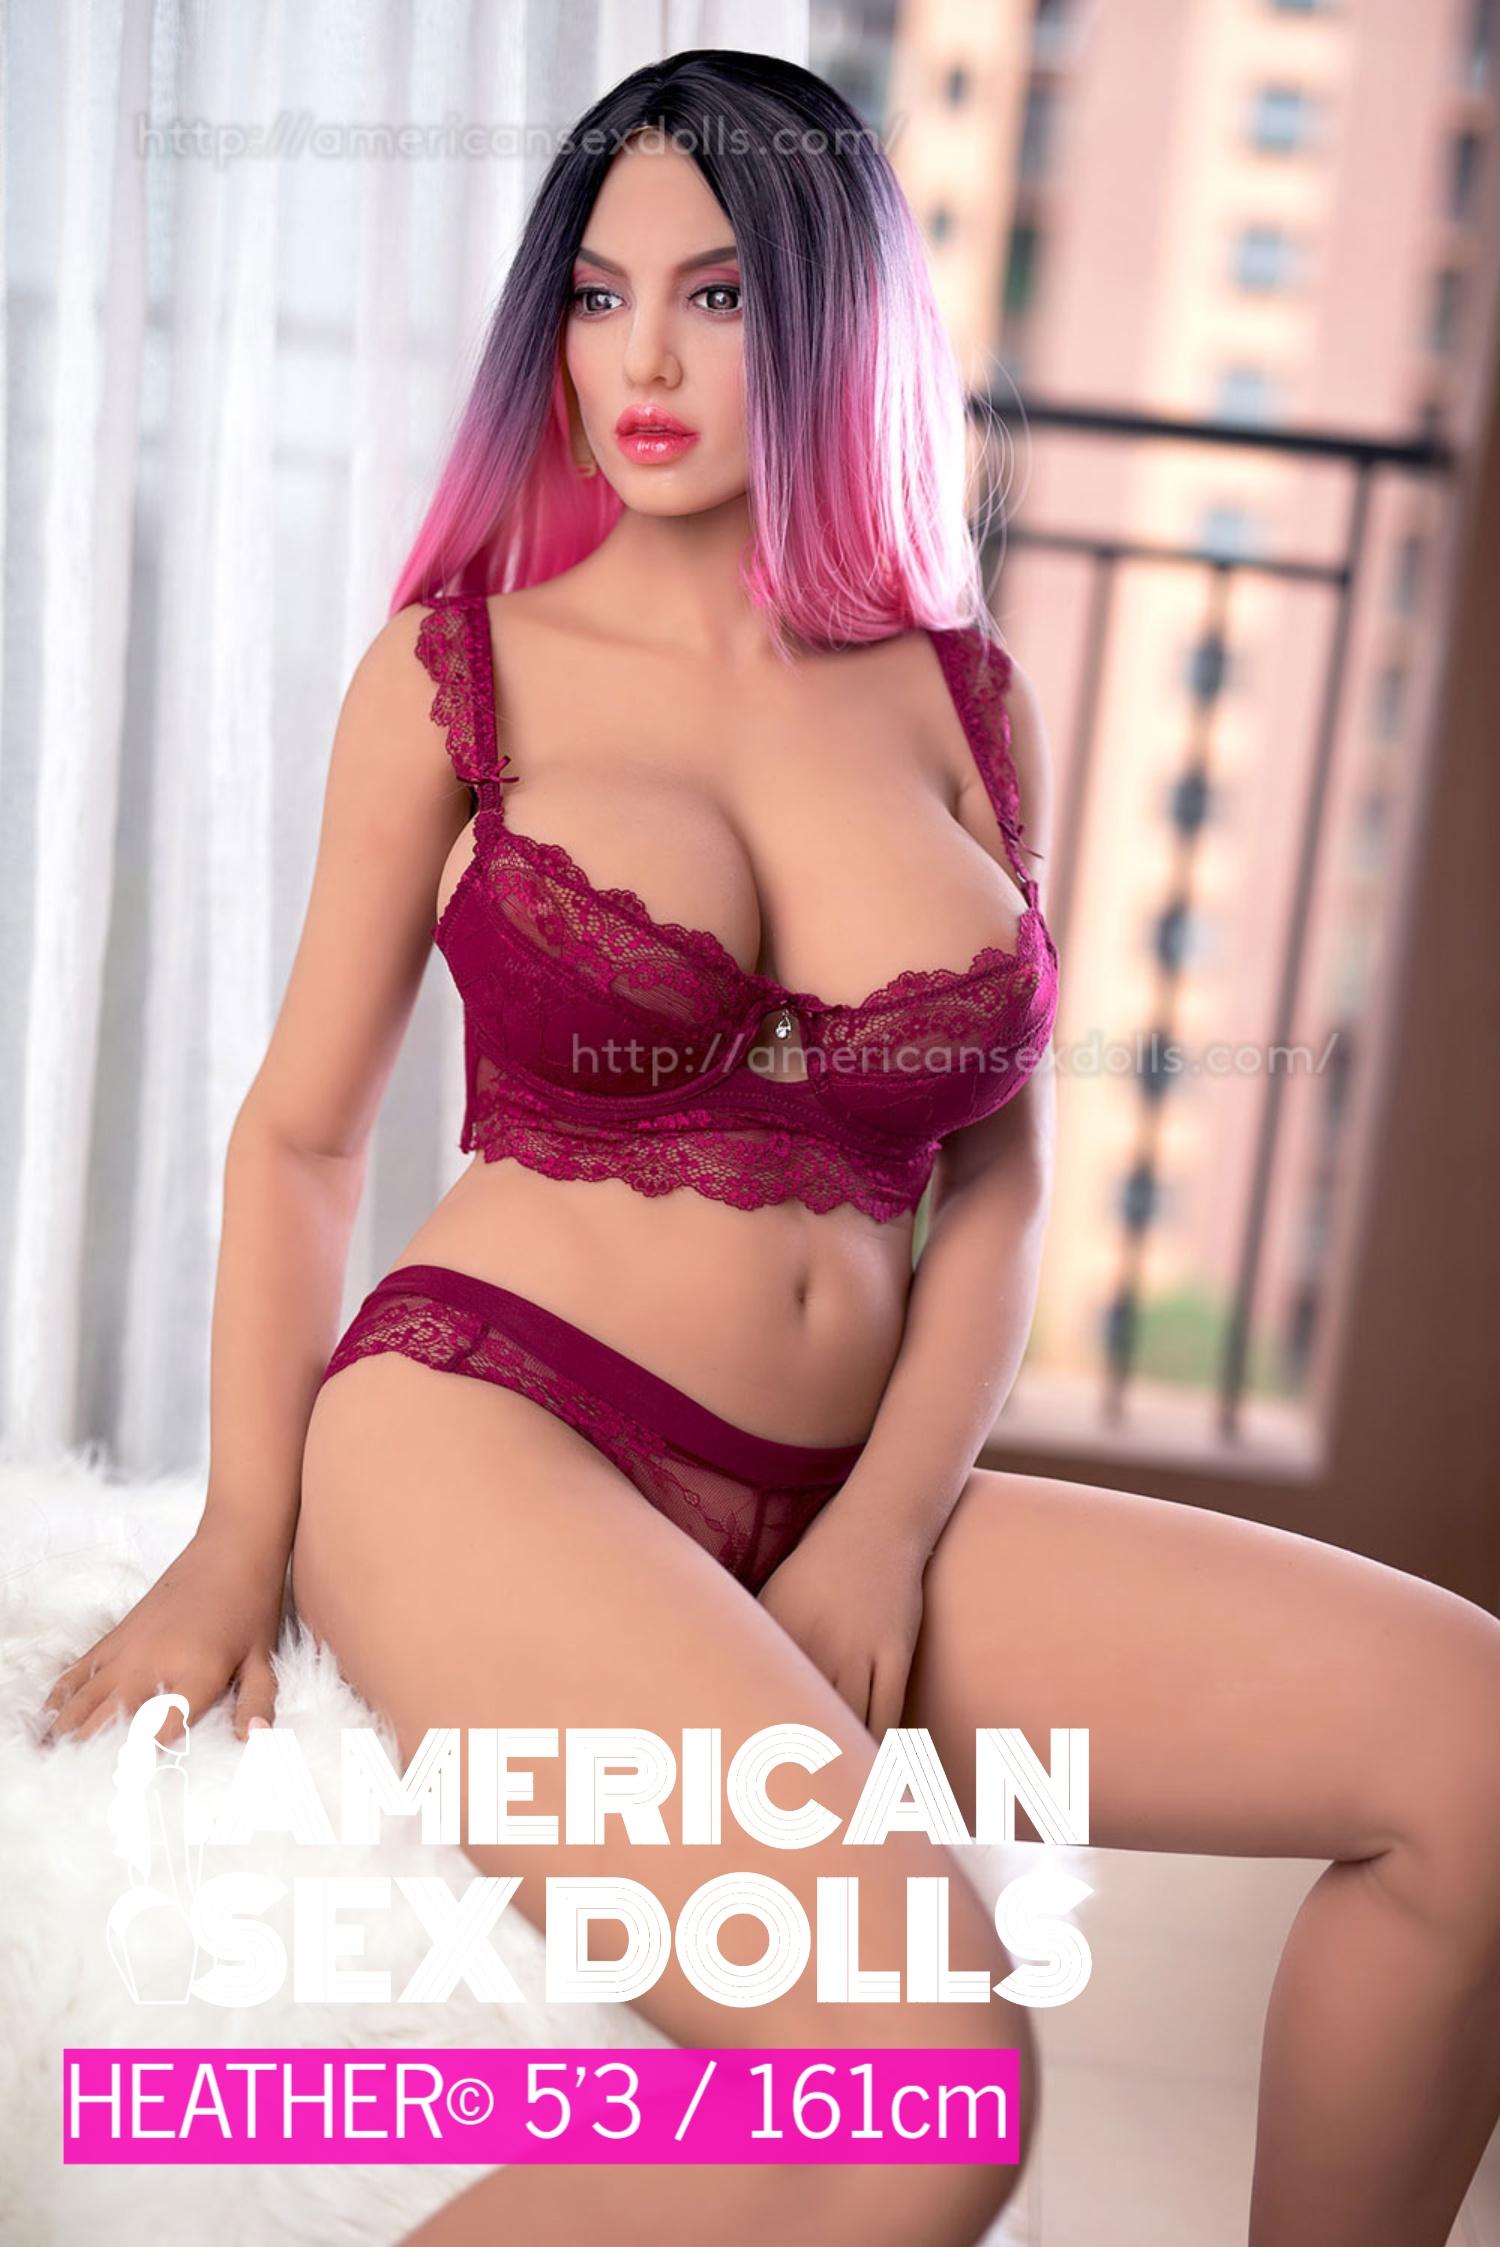 American Sex Dolls 6Ye Premium 161cm 33 (4).jpg